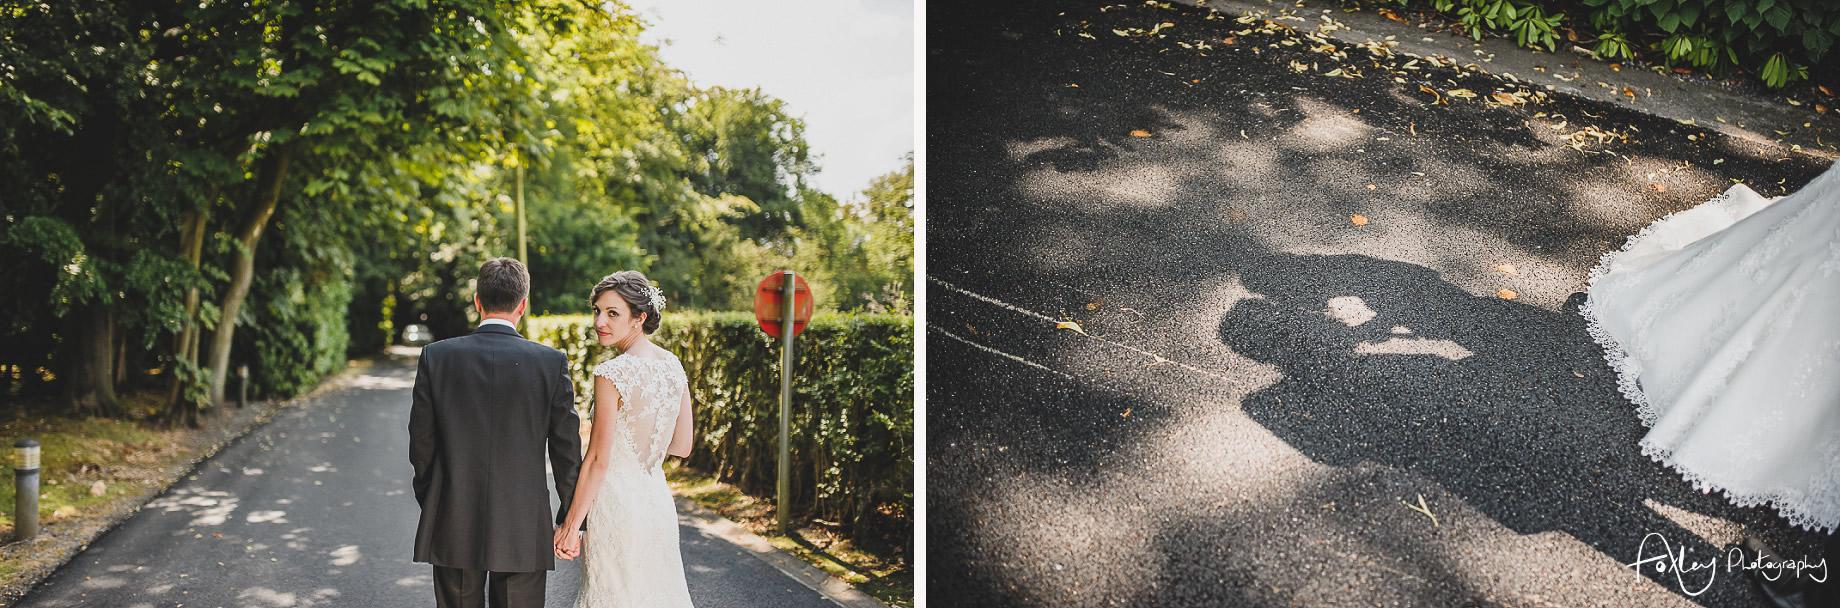 Rebecca and Dan Wedding at Preston Marriott Hotel 084